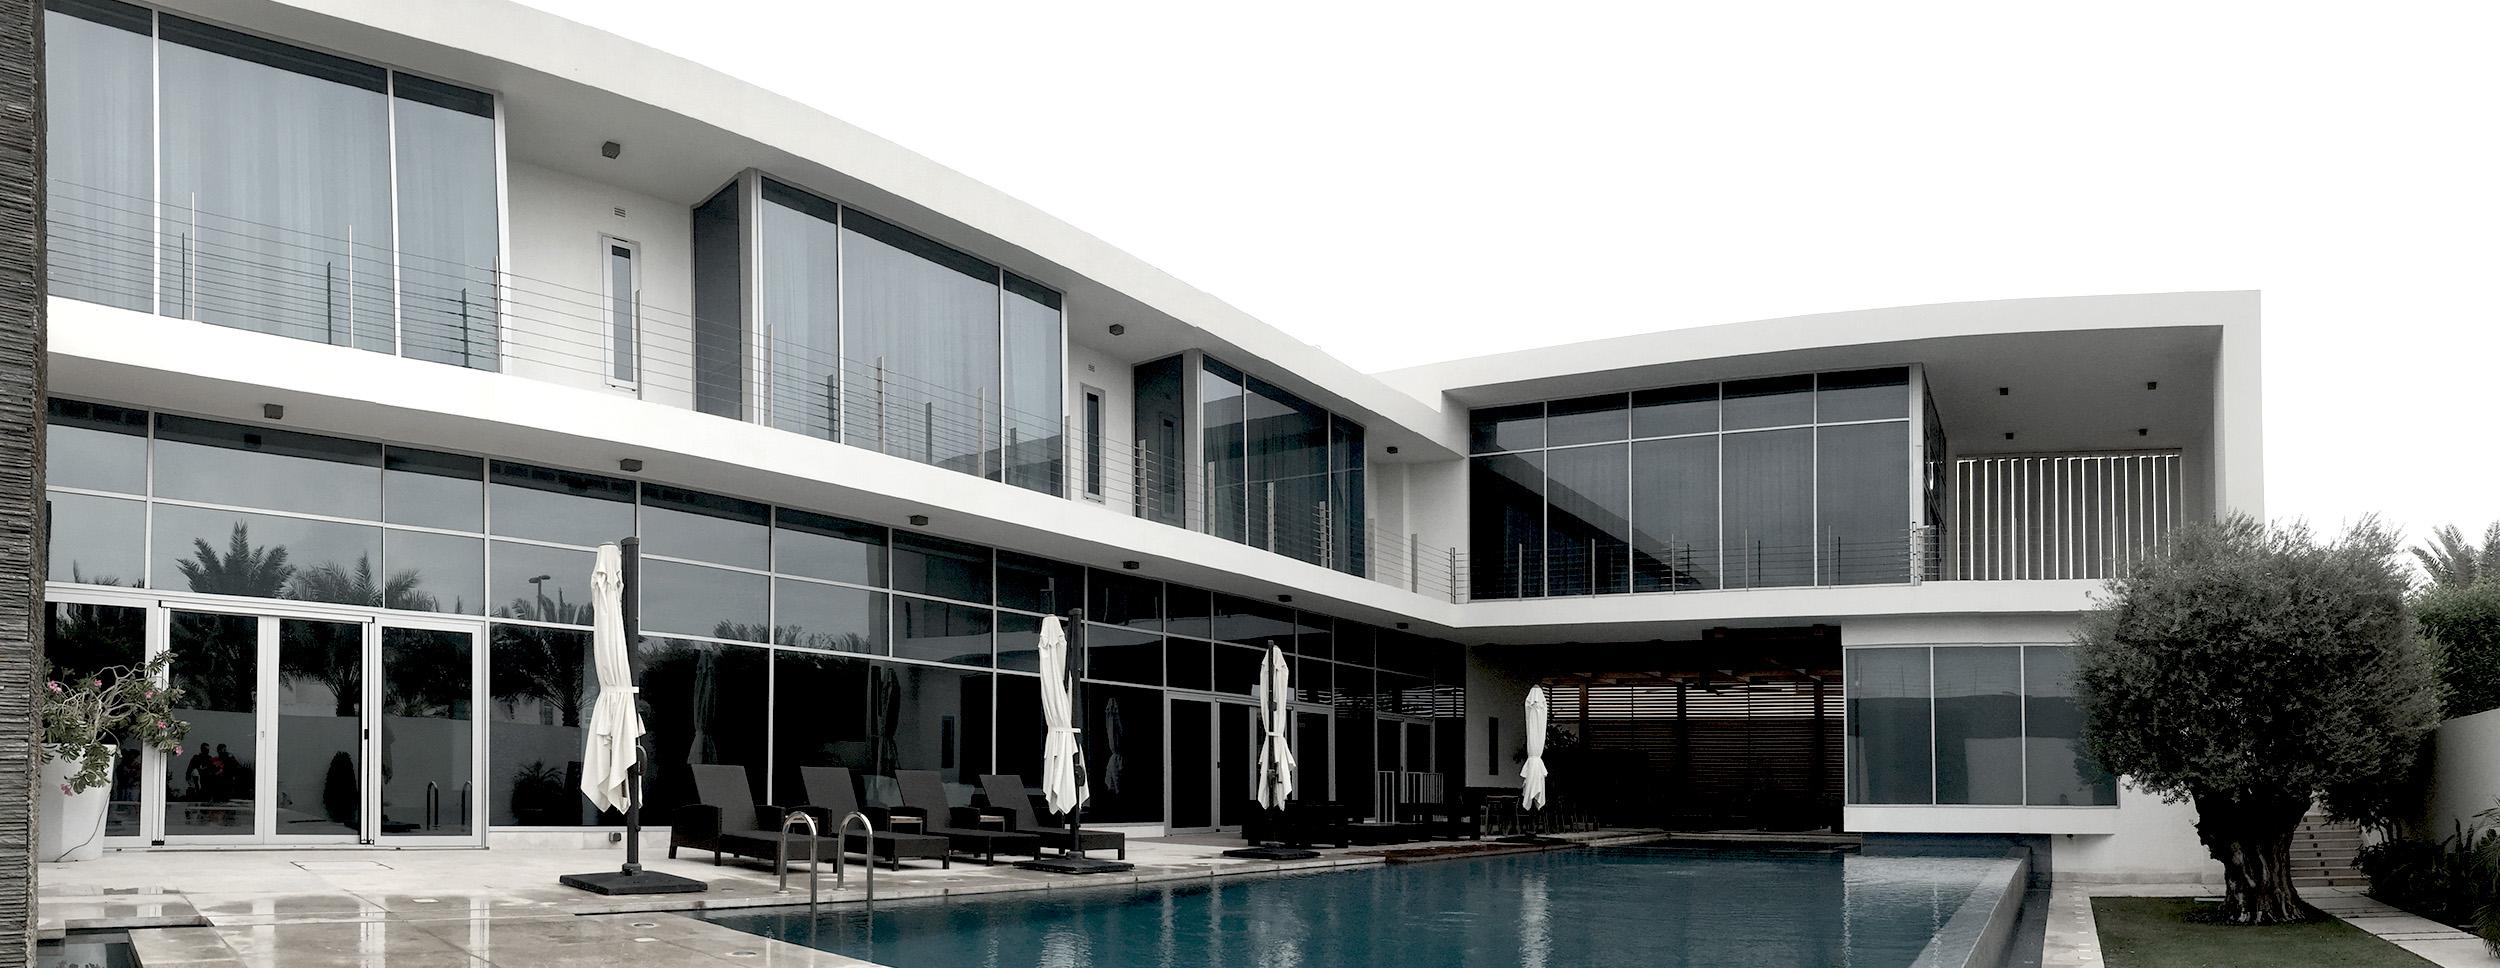 BEAD Contemporary villa 1 photo.JPG